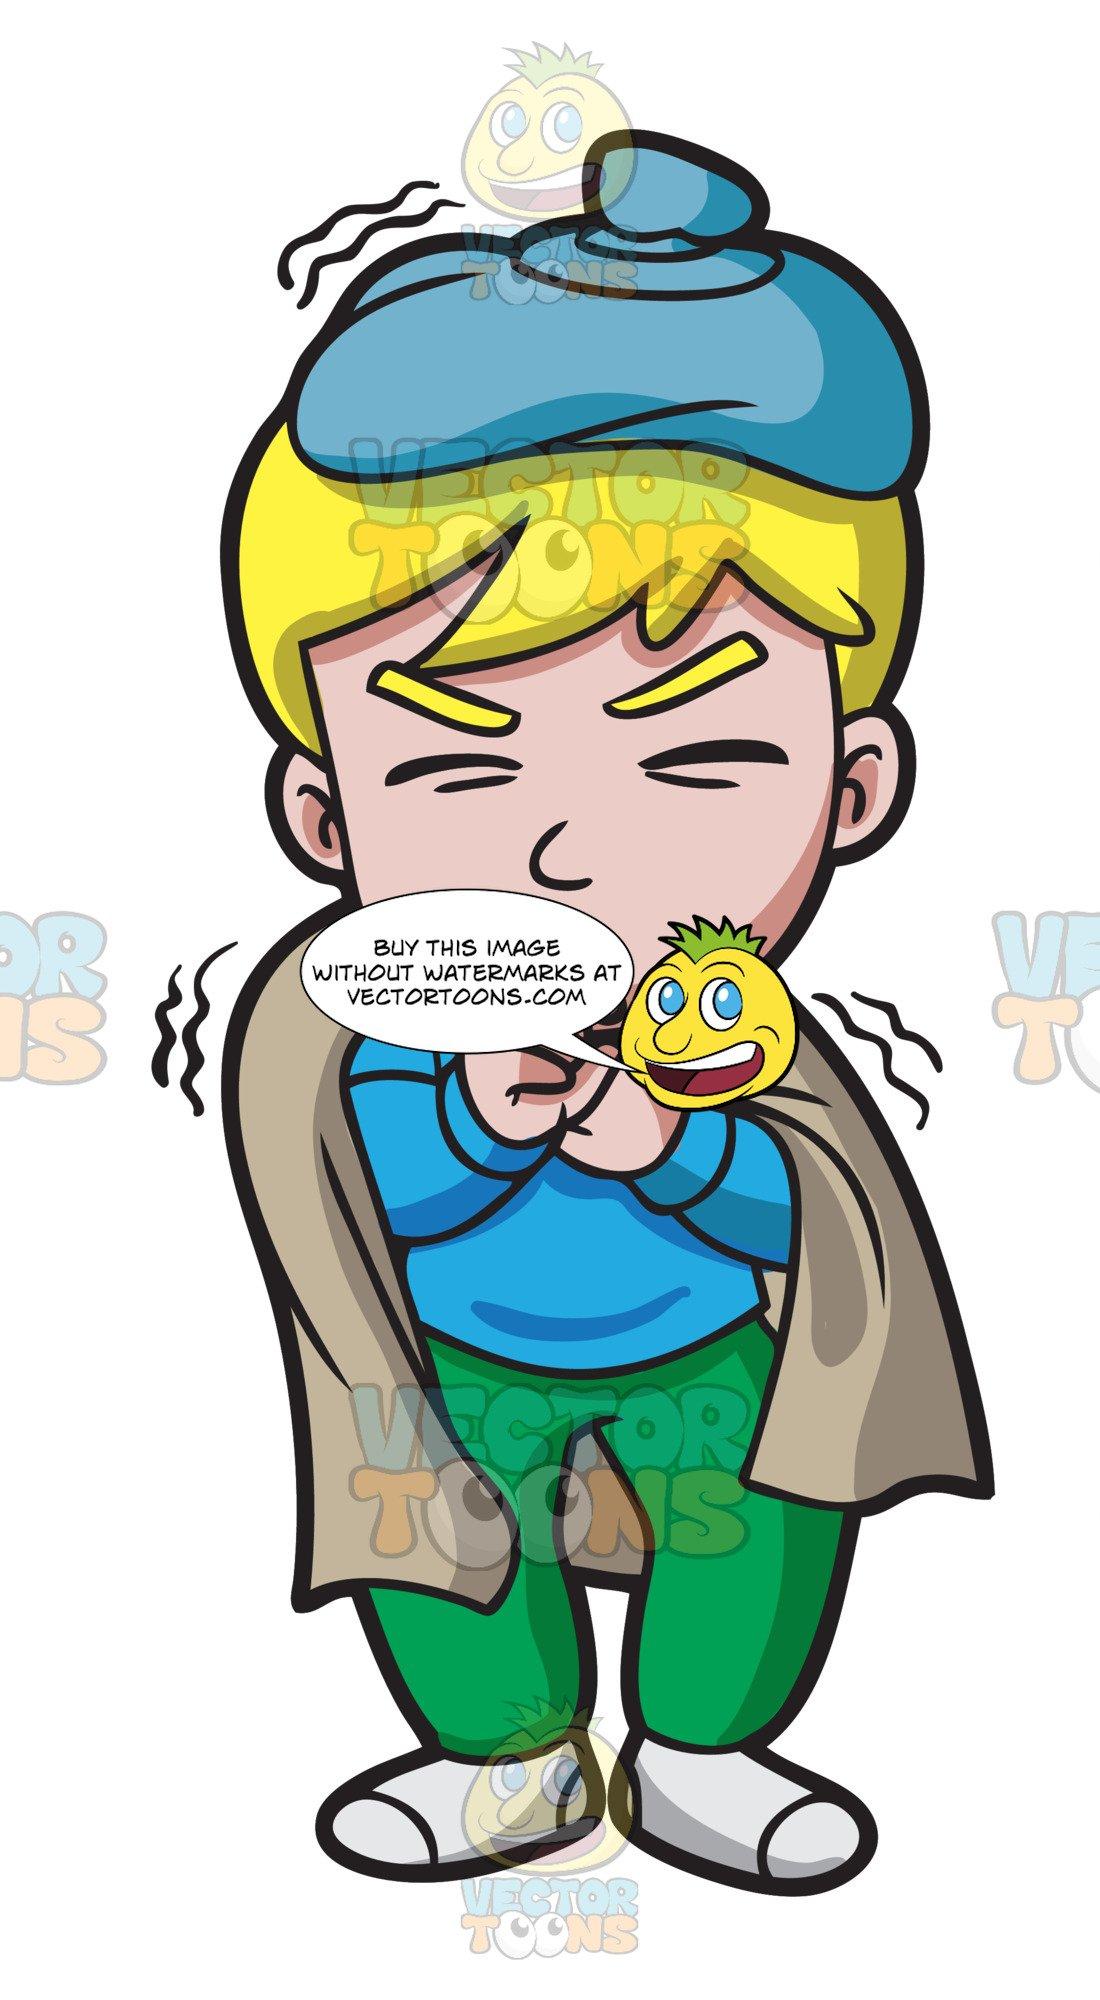 A Sick Boy With A Horrible Cough.